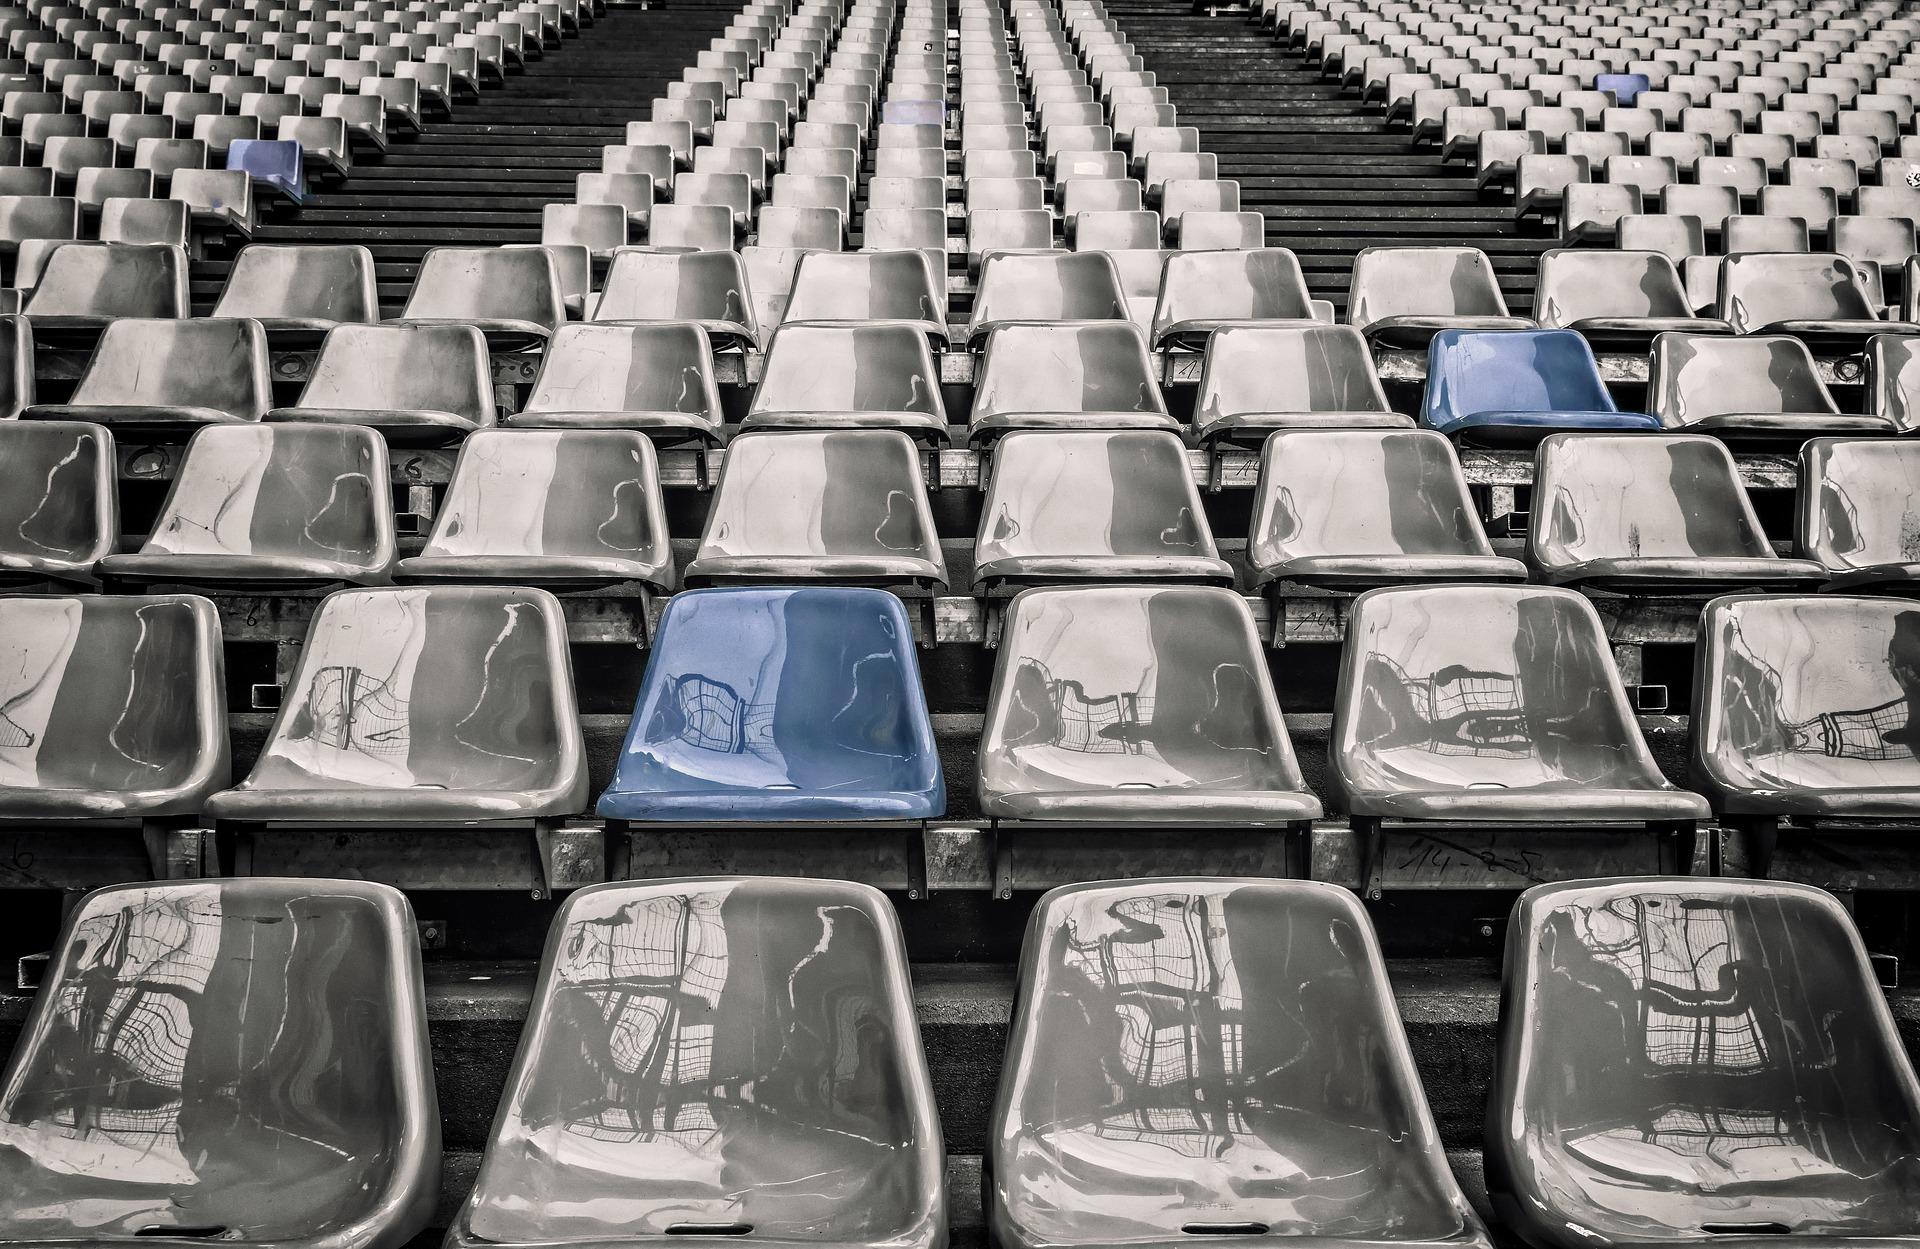 Aumento capienza stadio, teatro, cinema: via libera dal Cts